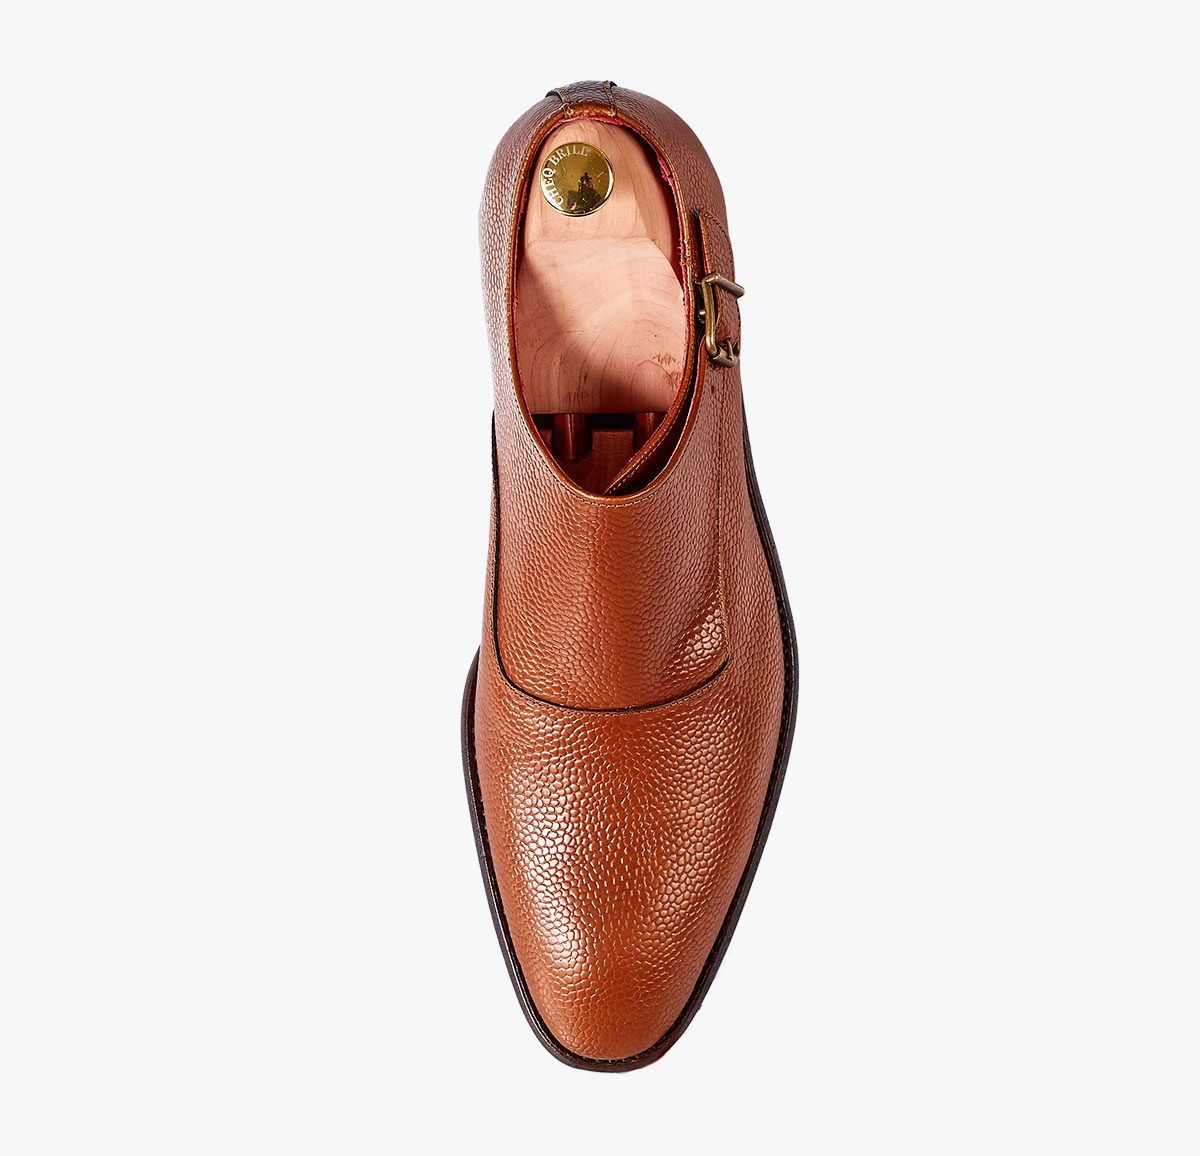 Zapato Clooney Sándalo hecho a mano en mandalashoes, Santanyí Mallorca. Hand made shoes. Nach Mass Schuhe